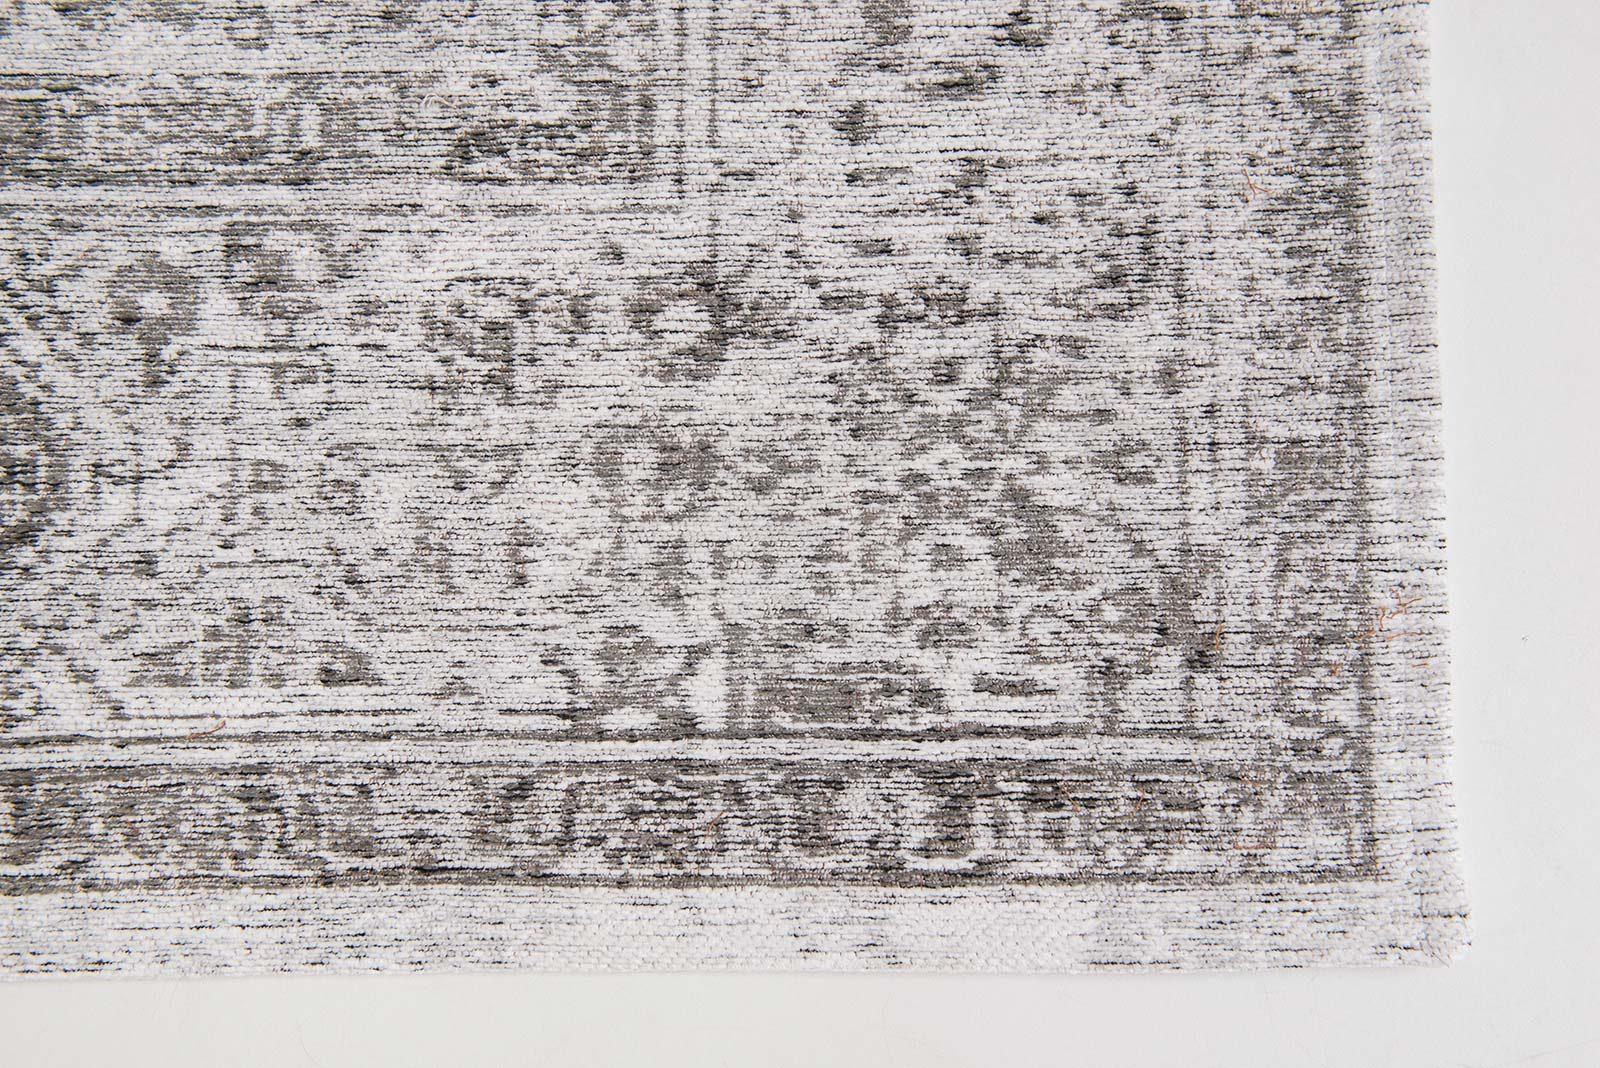 rugs Louis De Poortere LX8668 Fairfield Pale corner